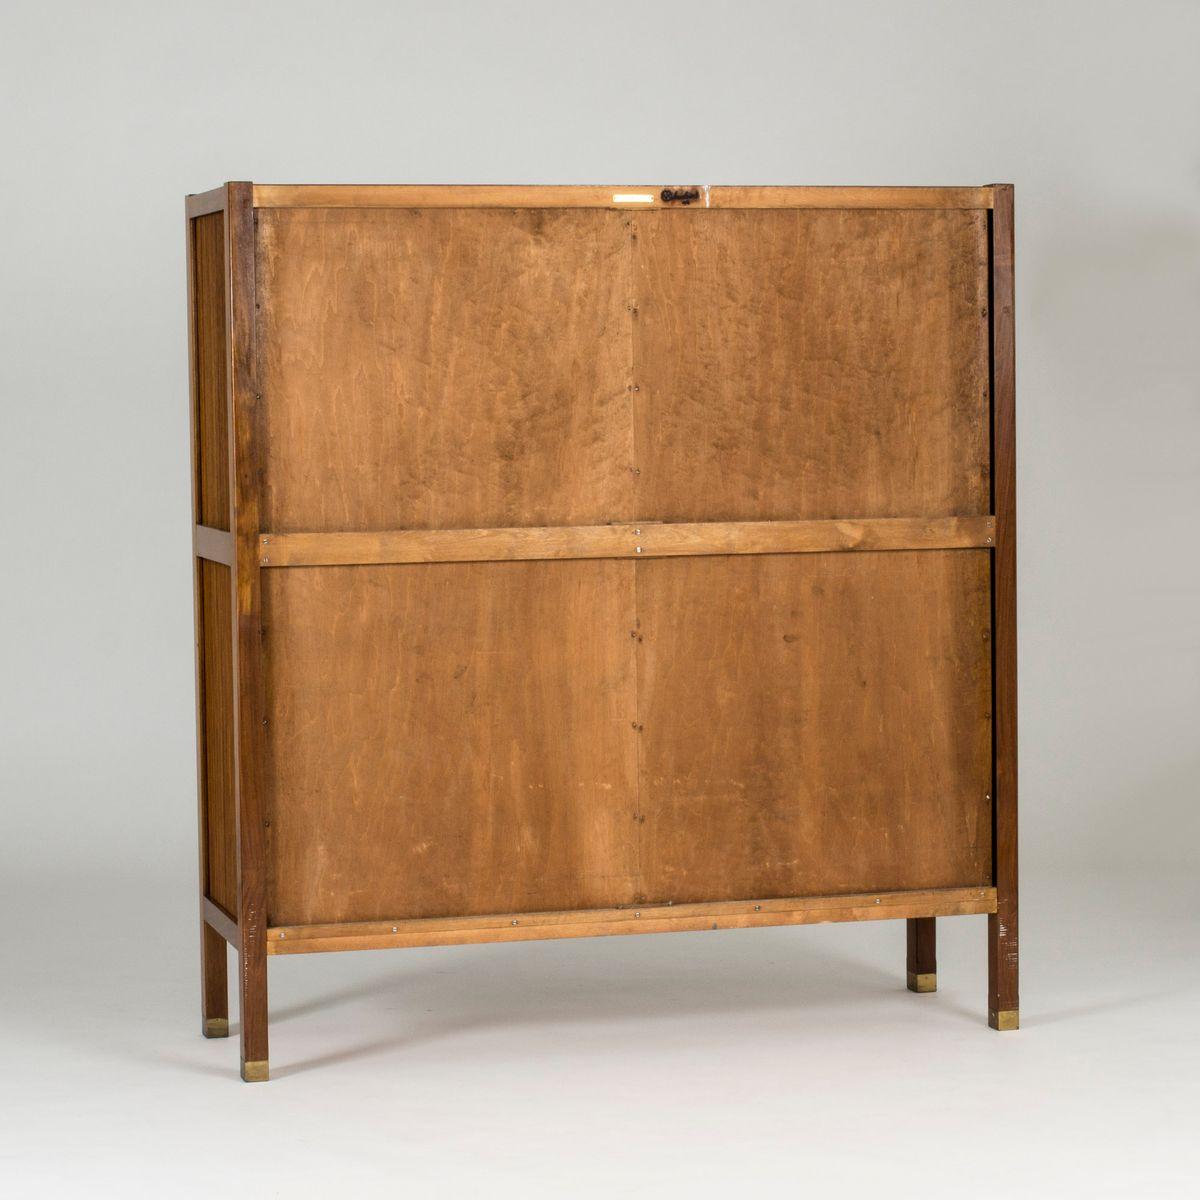 meuble en noyer par carl axel acking pour nordiska kompaniet 1950s